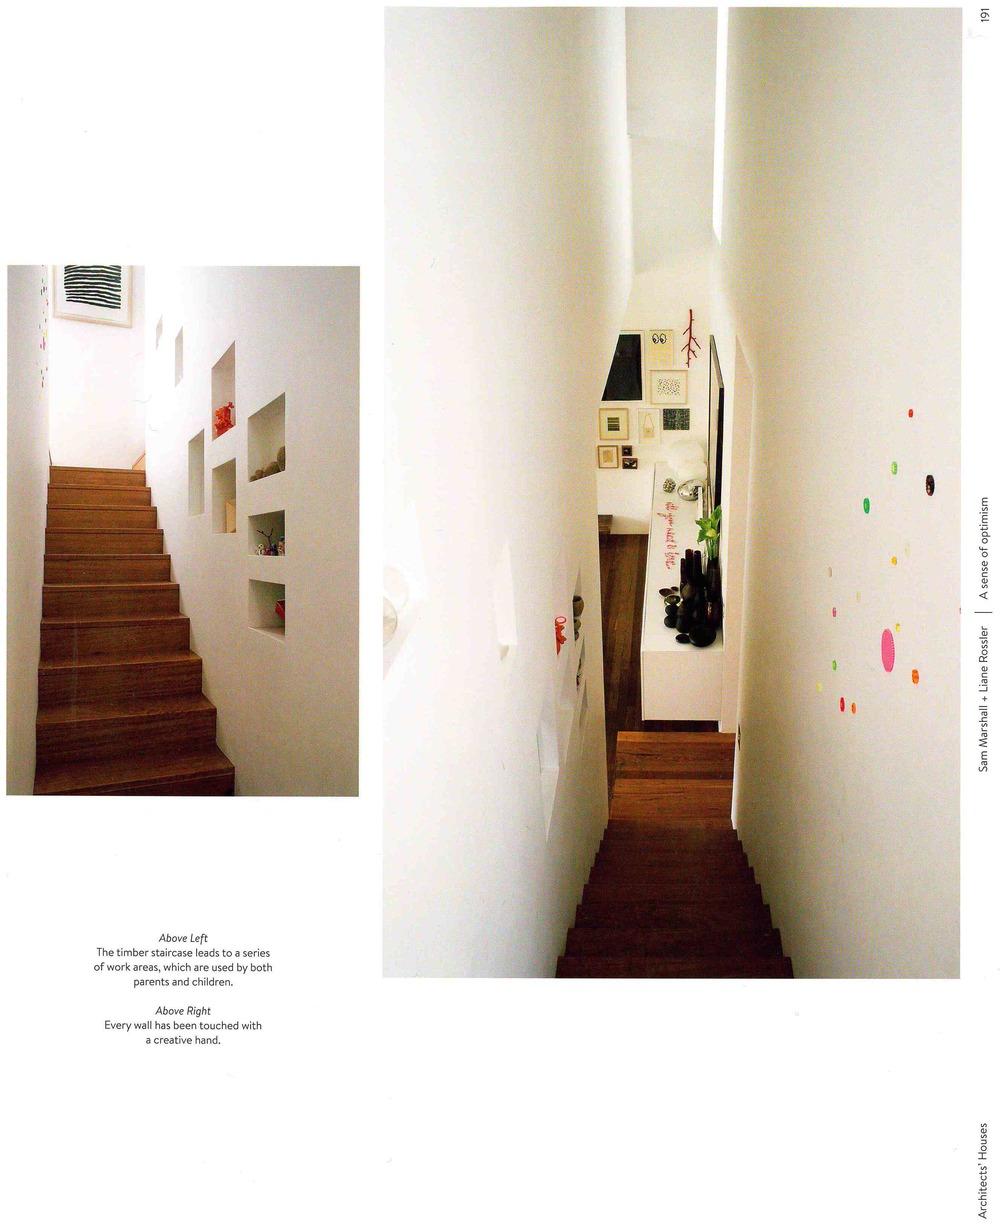 QP ARCHITECTS HOUSES 2015 STEPHEN CRAFTI BOOK.jpg